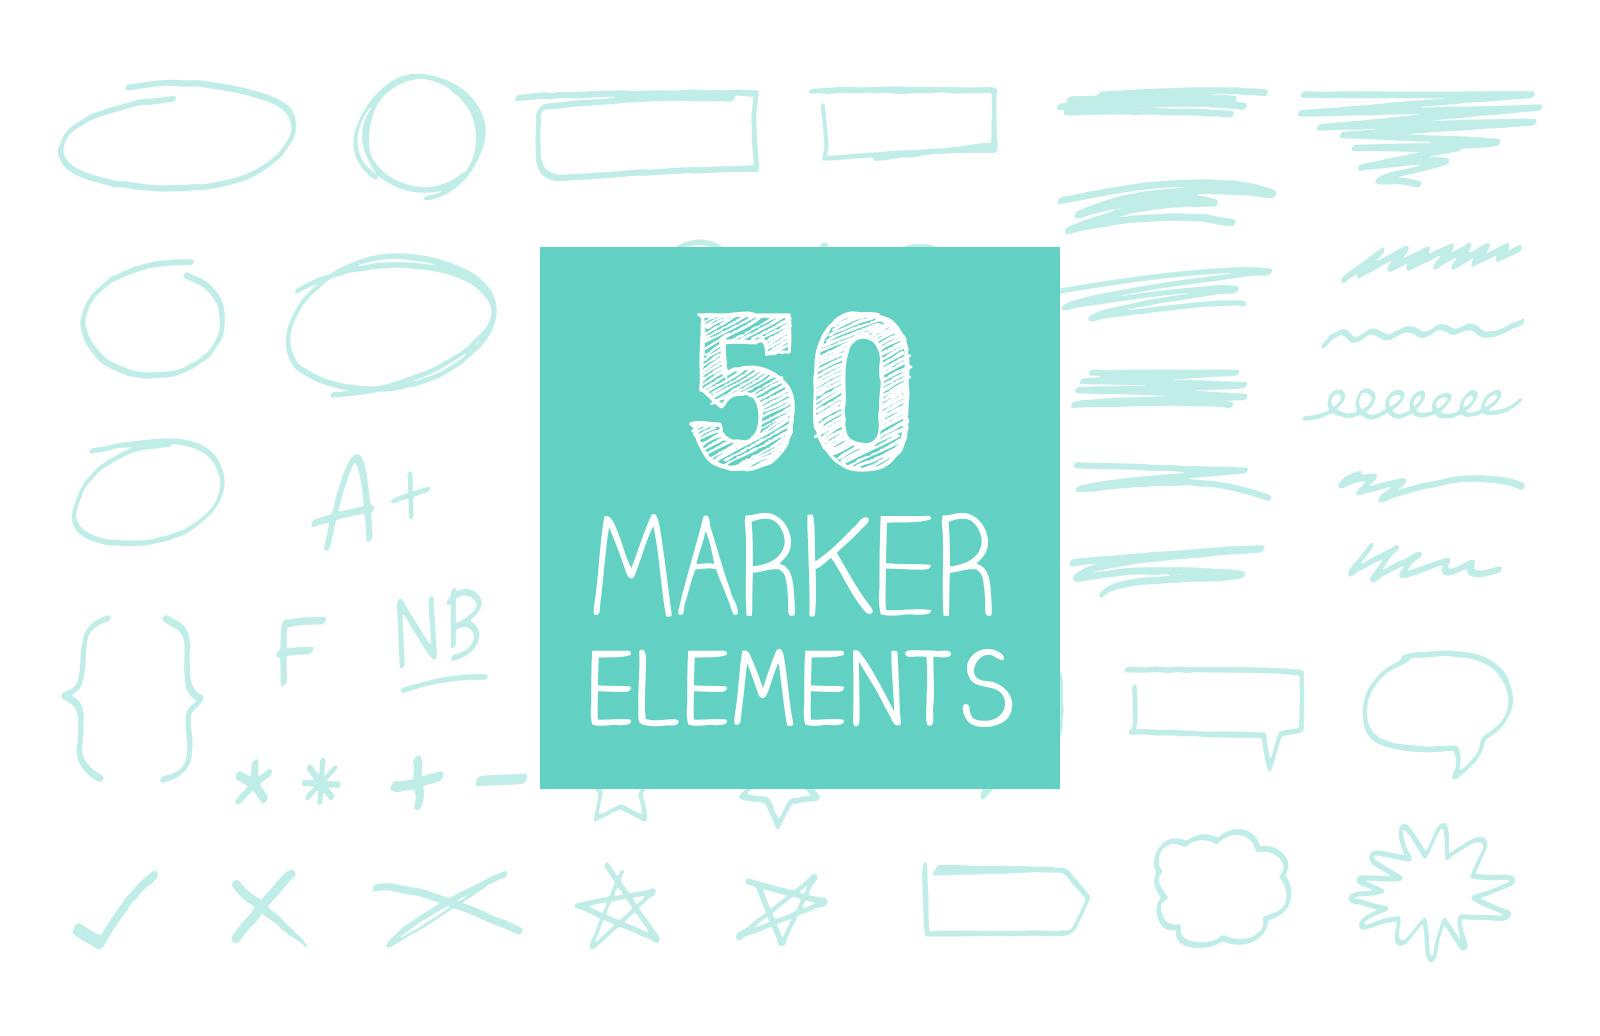 Hand Drawn Marker Elements 1